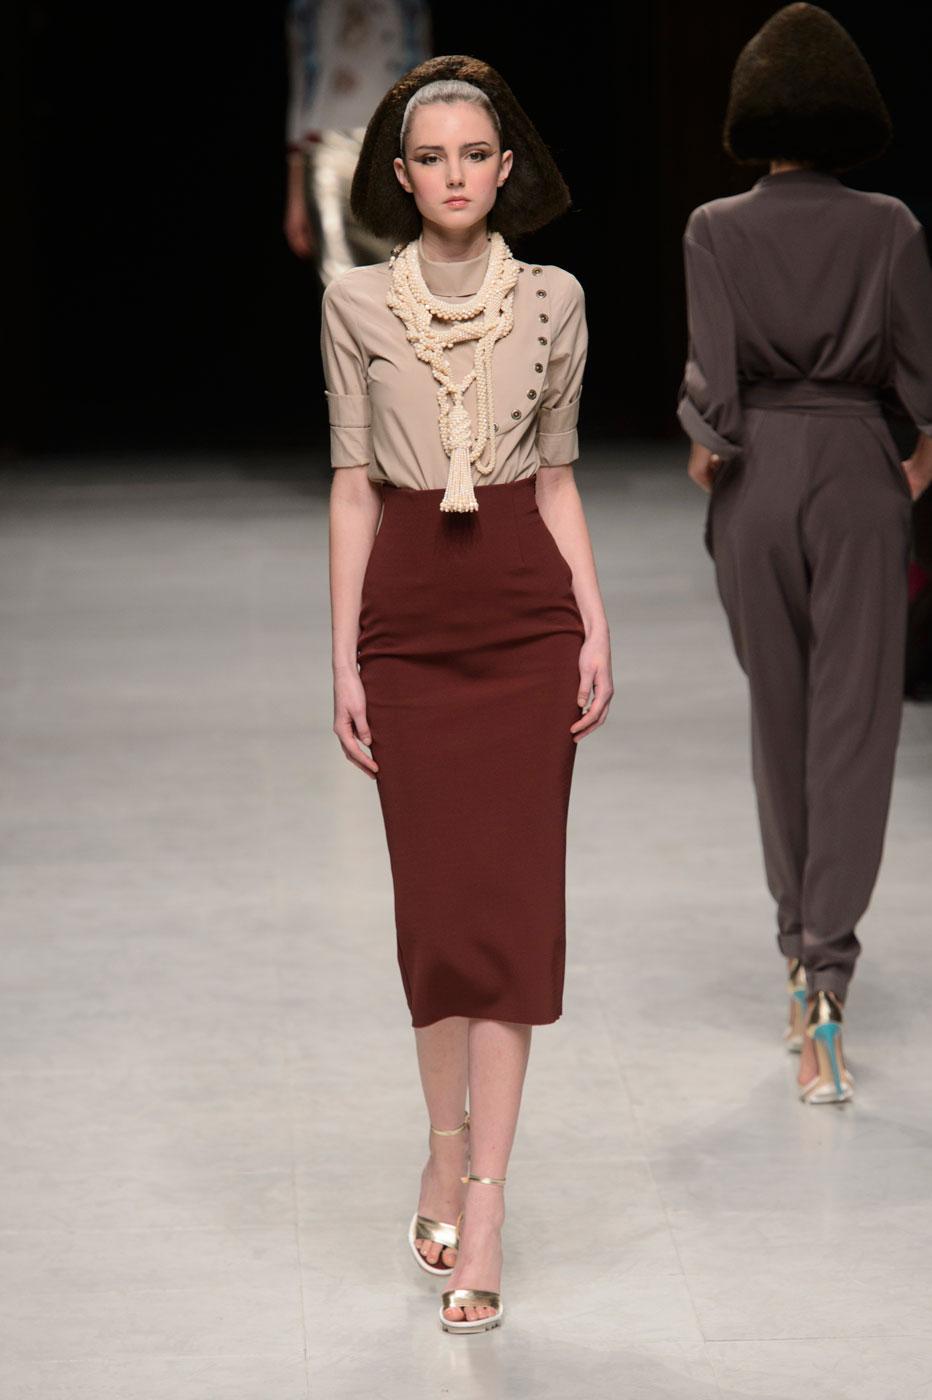 Julien-Fournie-Prive-fashion-runway-show-haute-couture-paris-spring-2015-the-impression-06